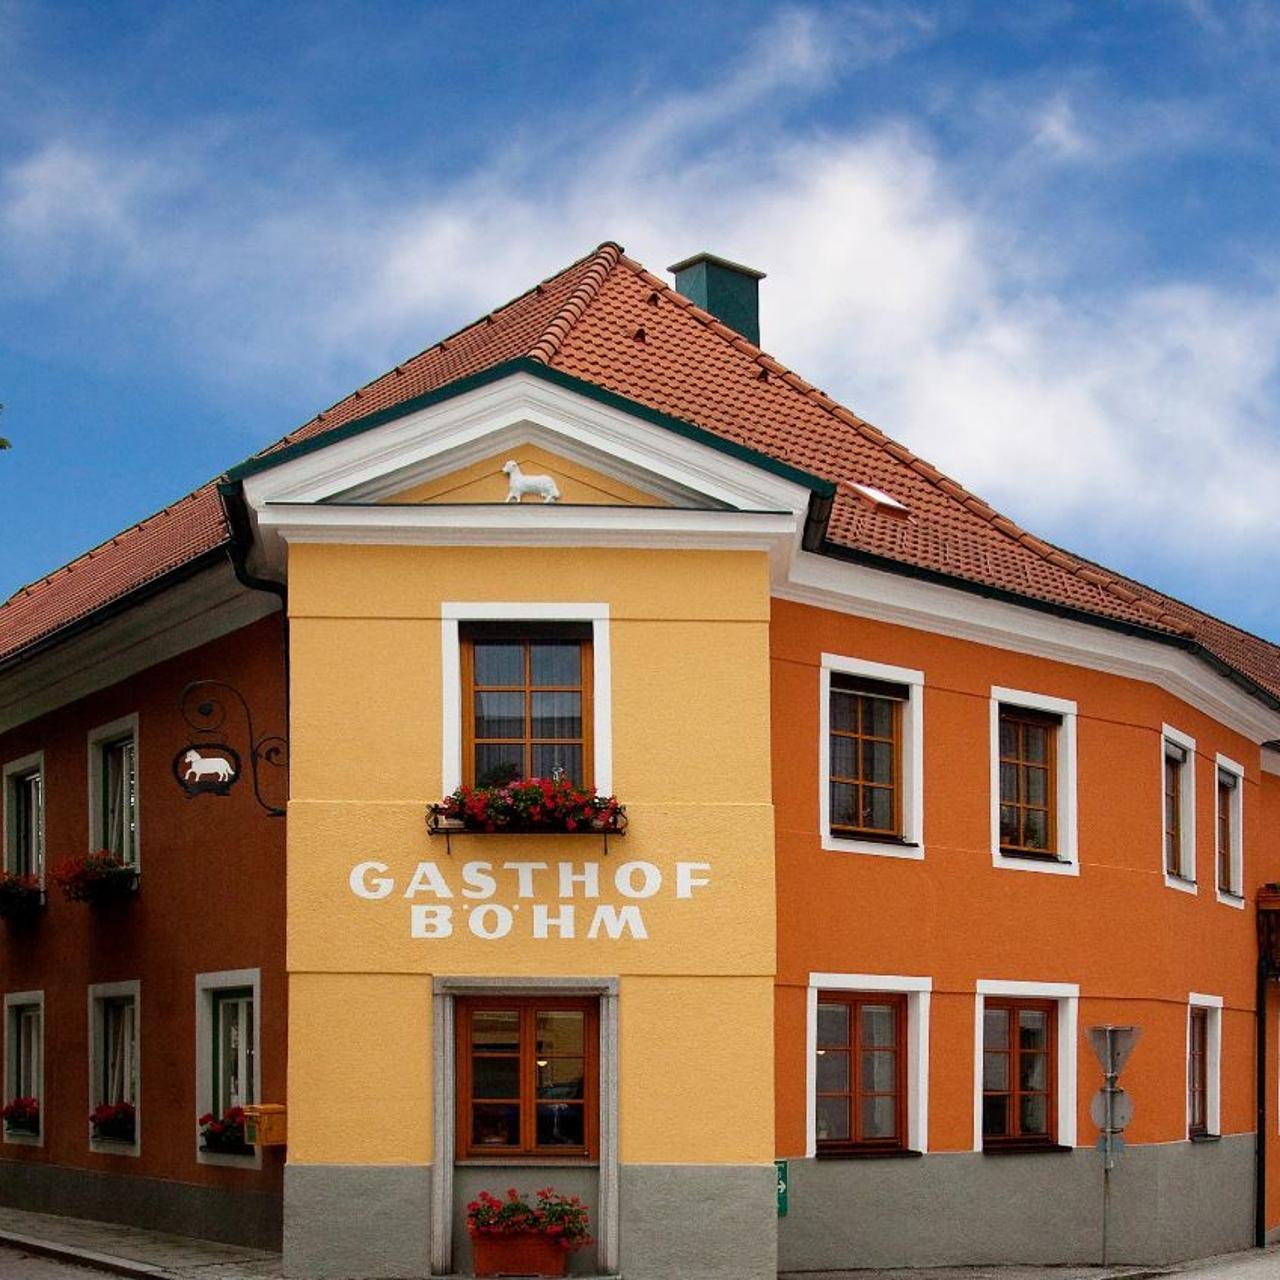 Polizeiinspektion Persenbeug, 3680 Persenbeug-Gottsdorf